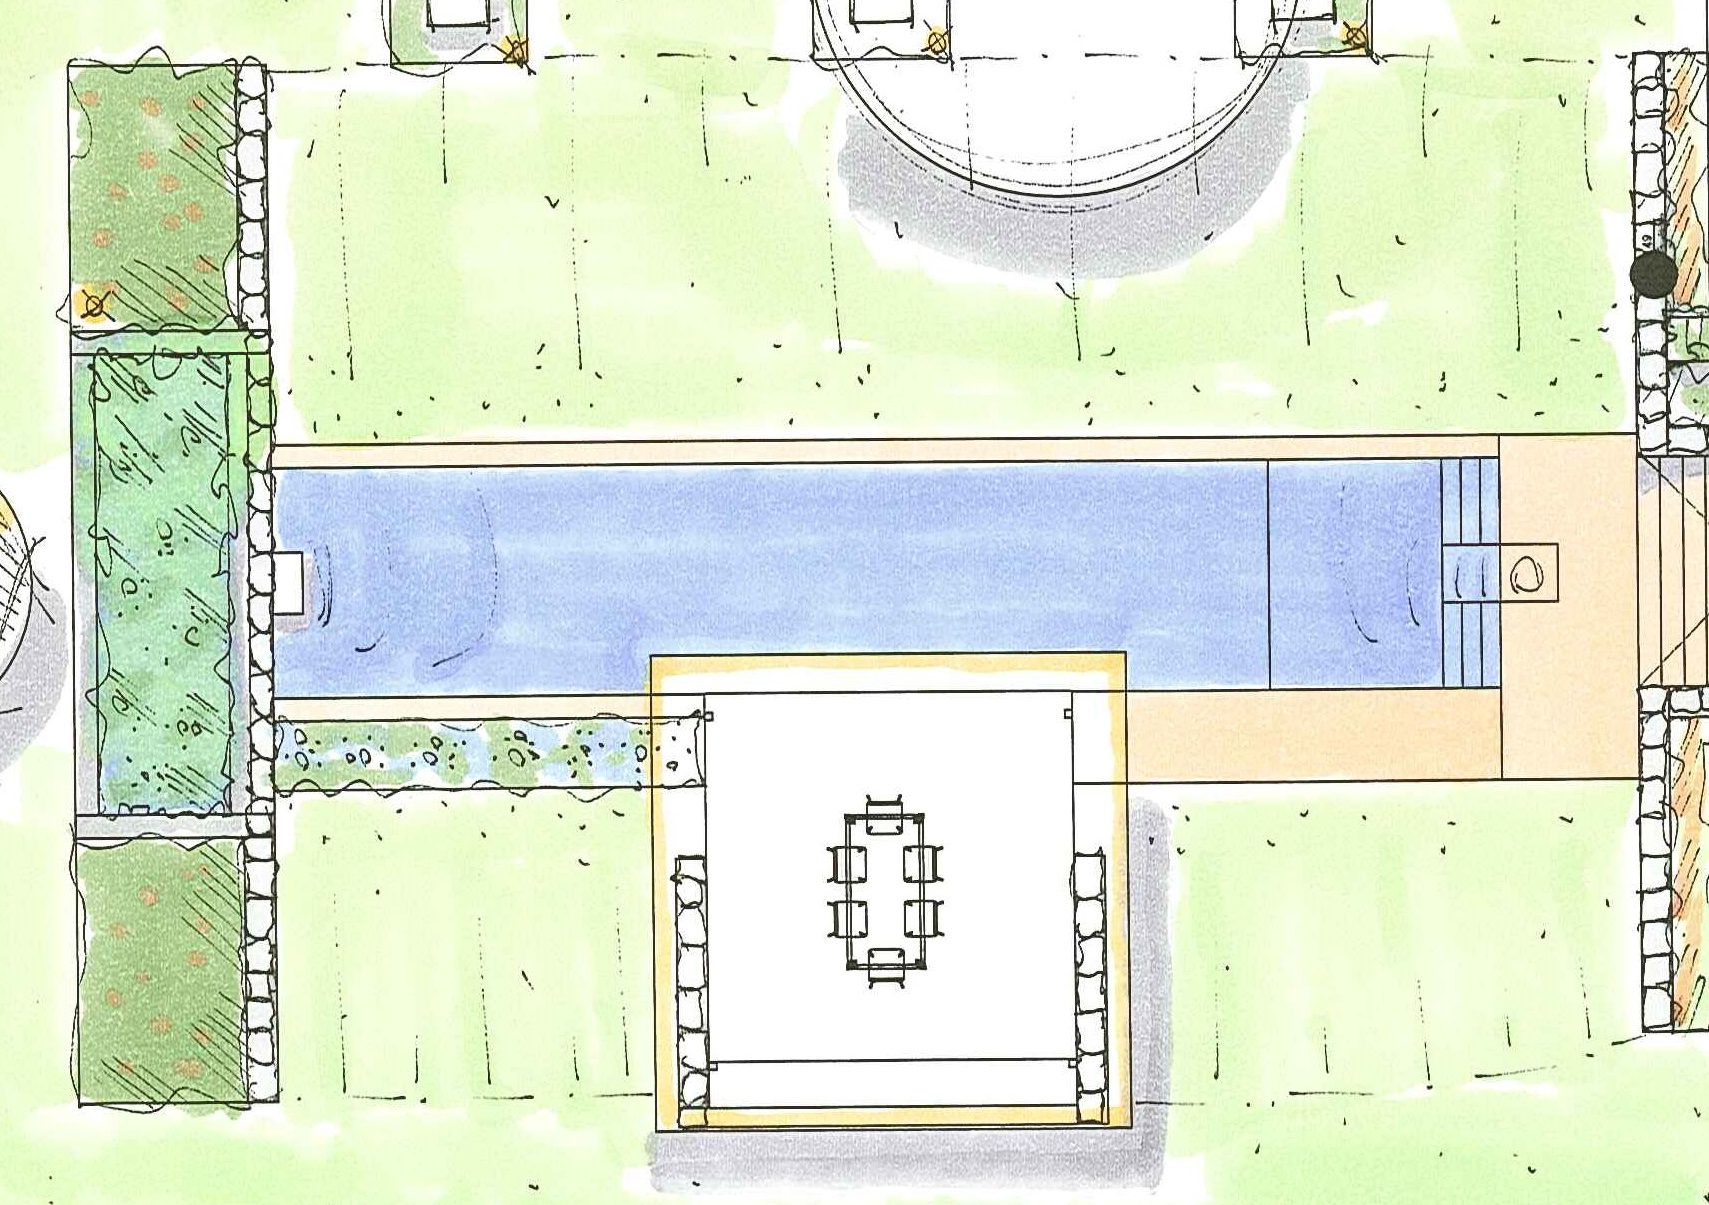 Living Pool Planung